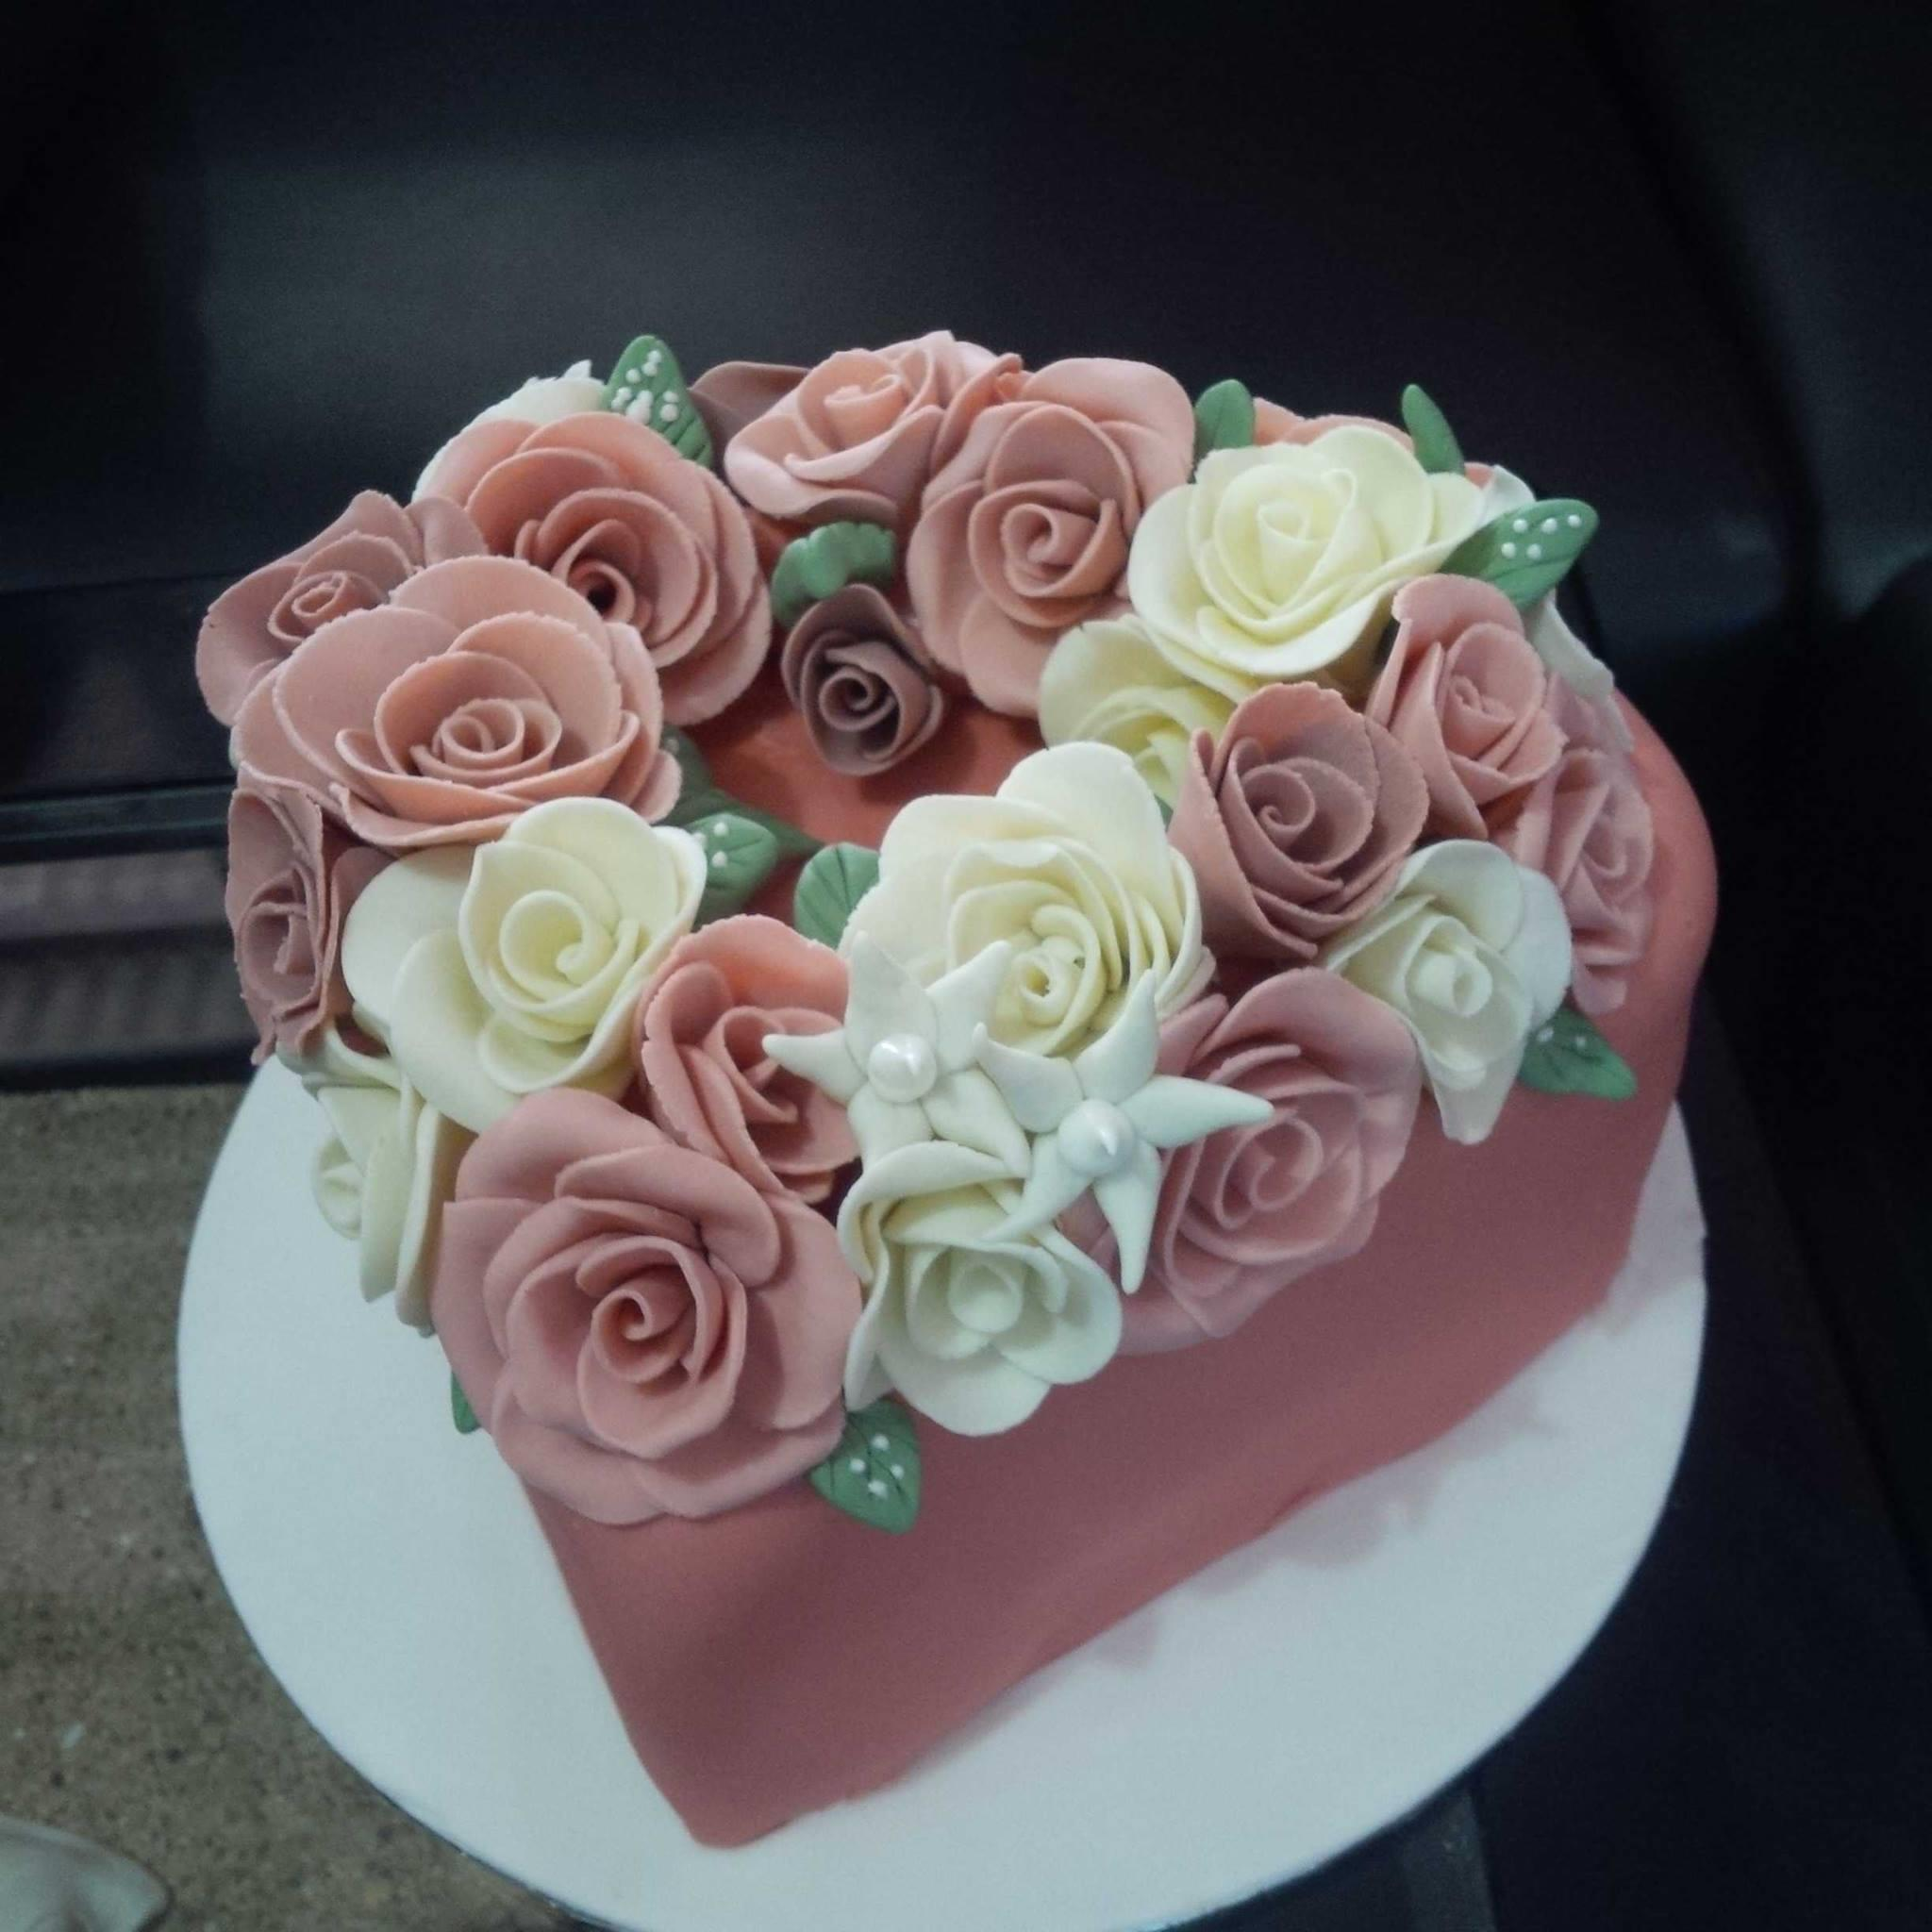 Jual Kue Ultah Love Harga Murah Jakarta Oleh Khena Cake